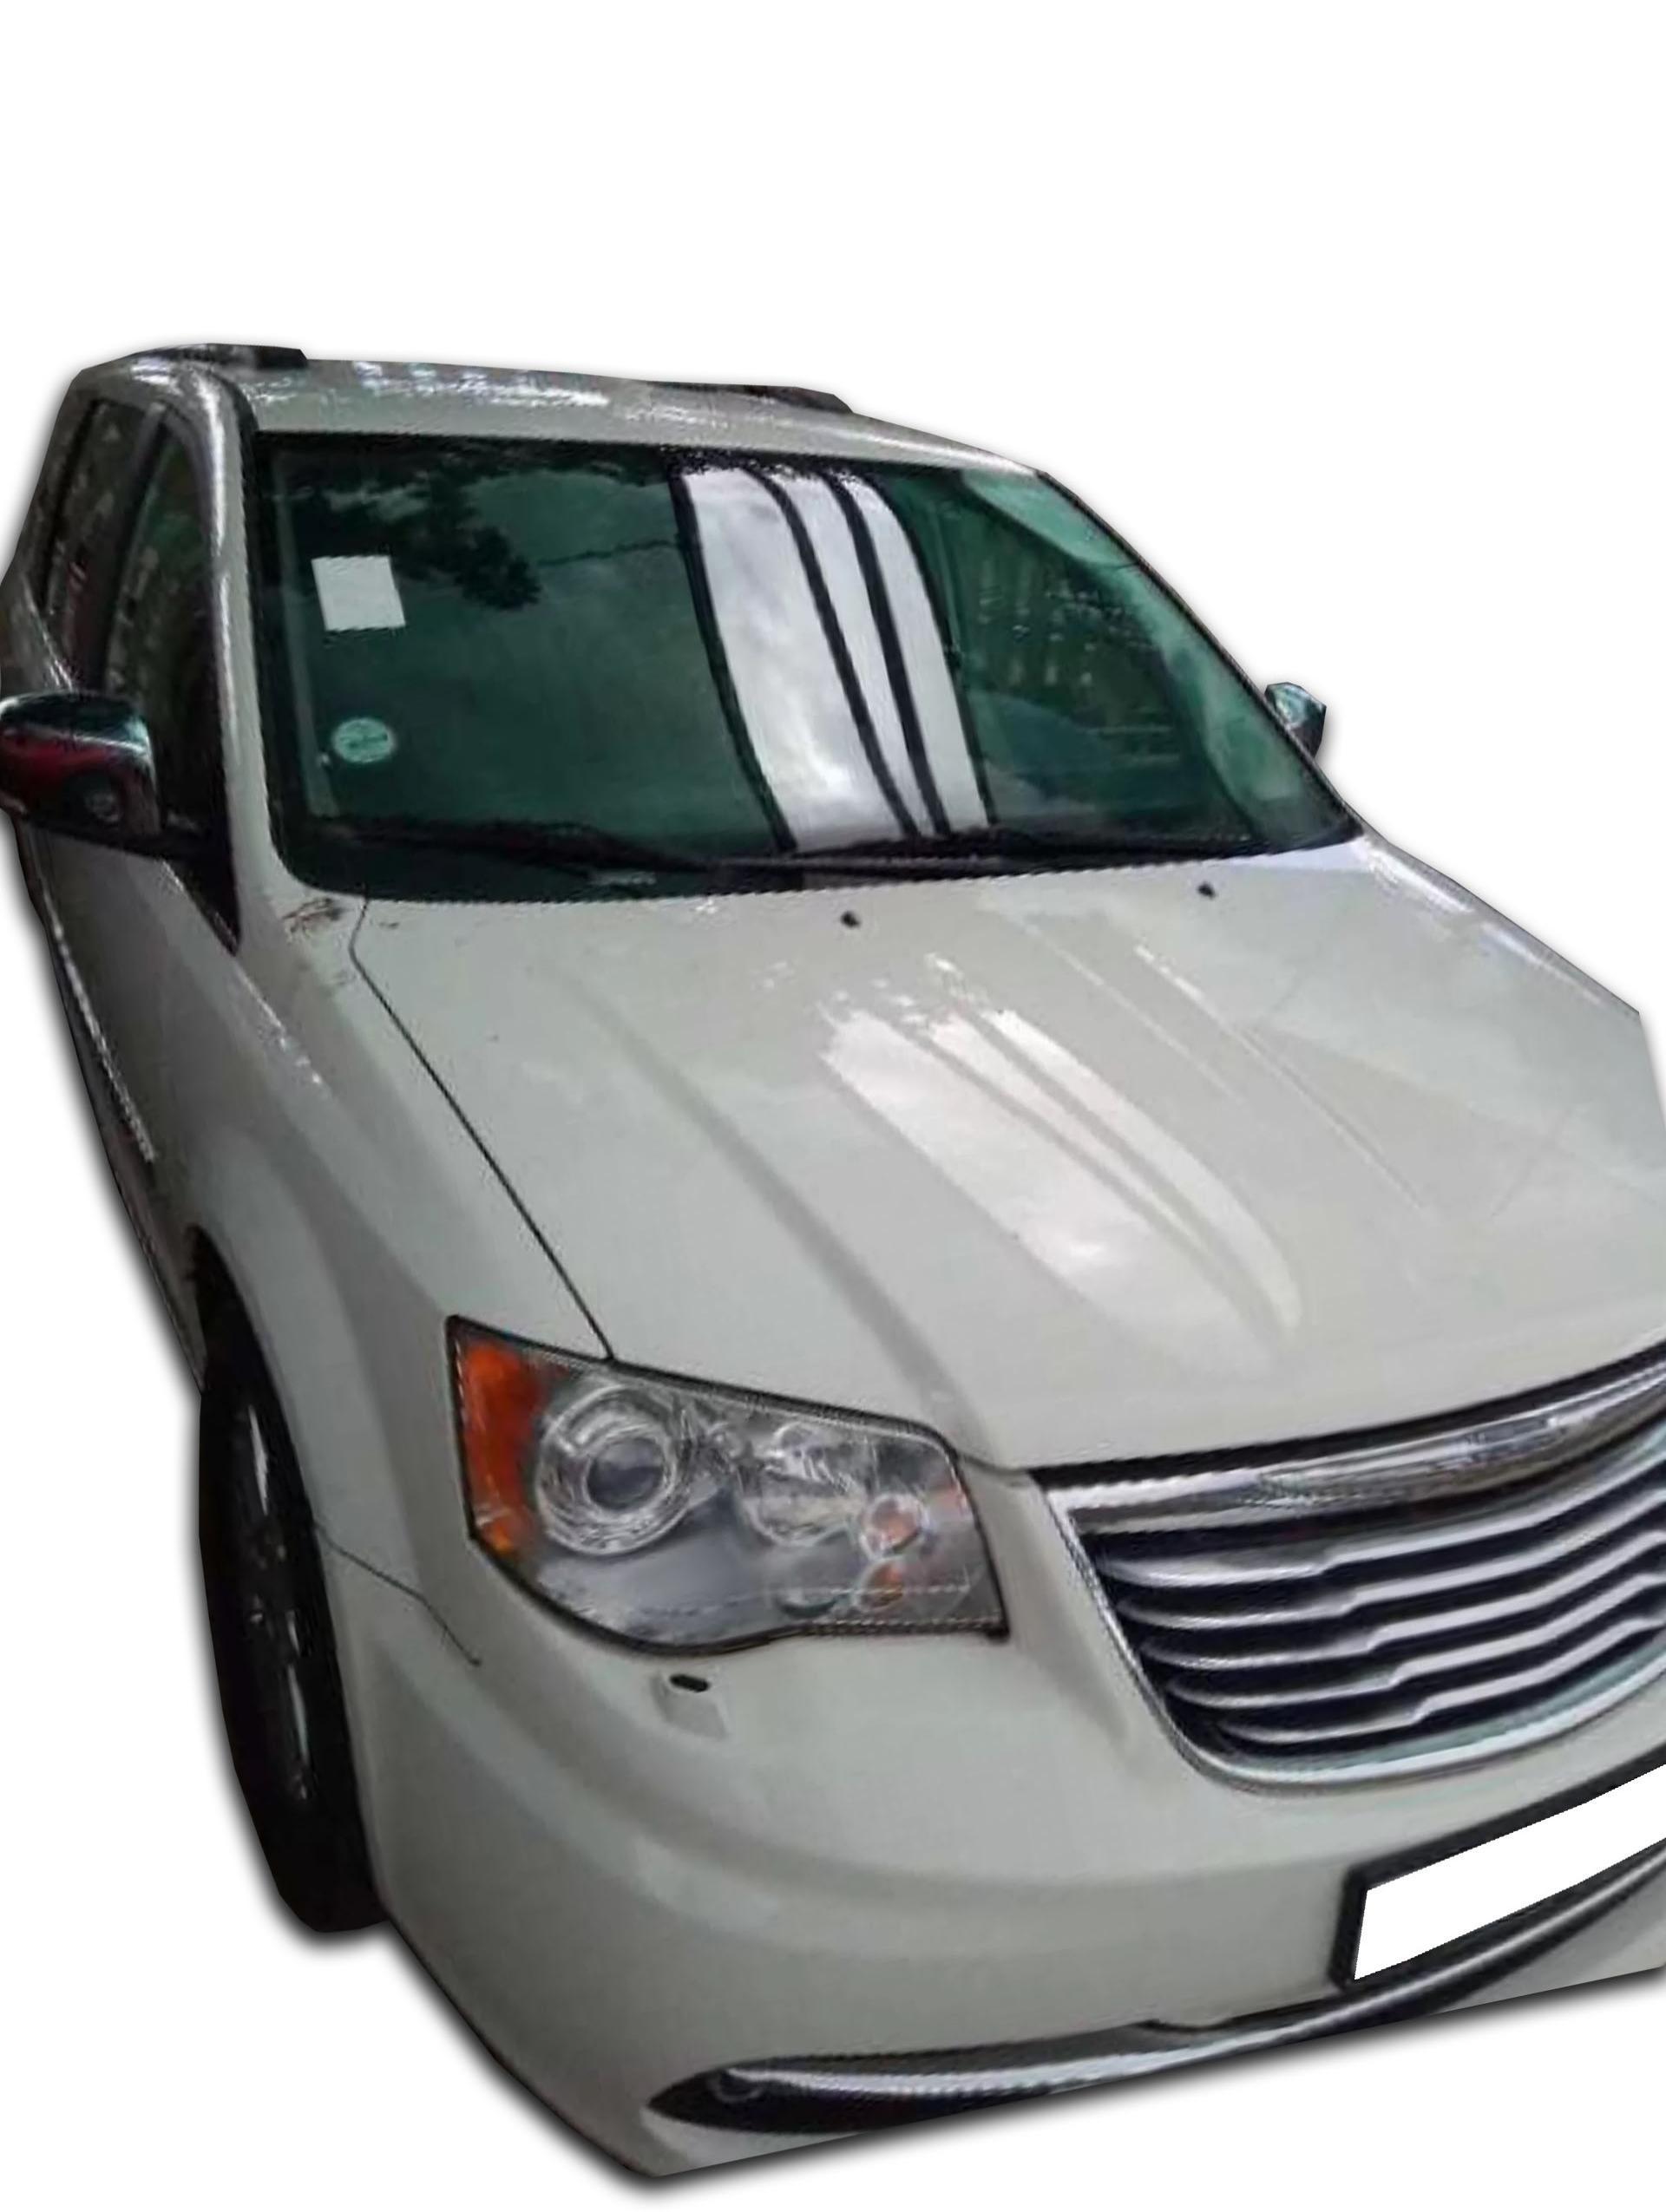 Chrysler Grand Voyager 2.8